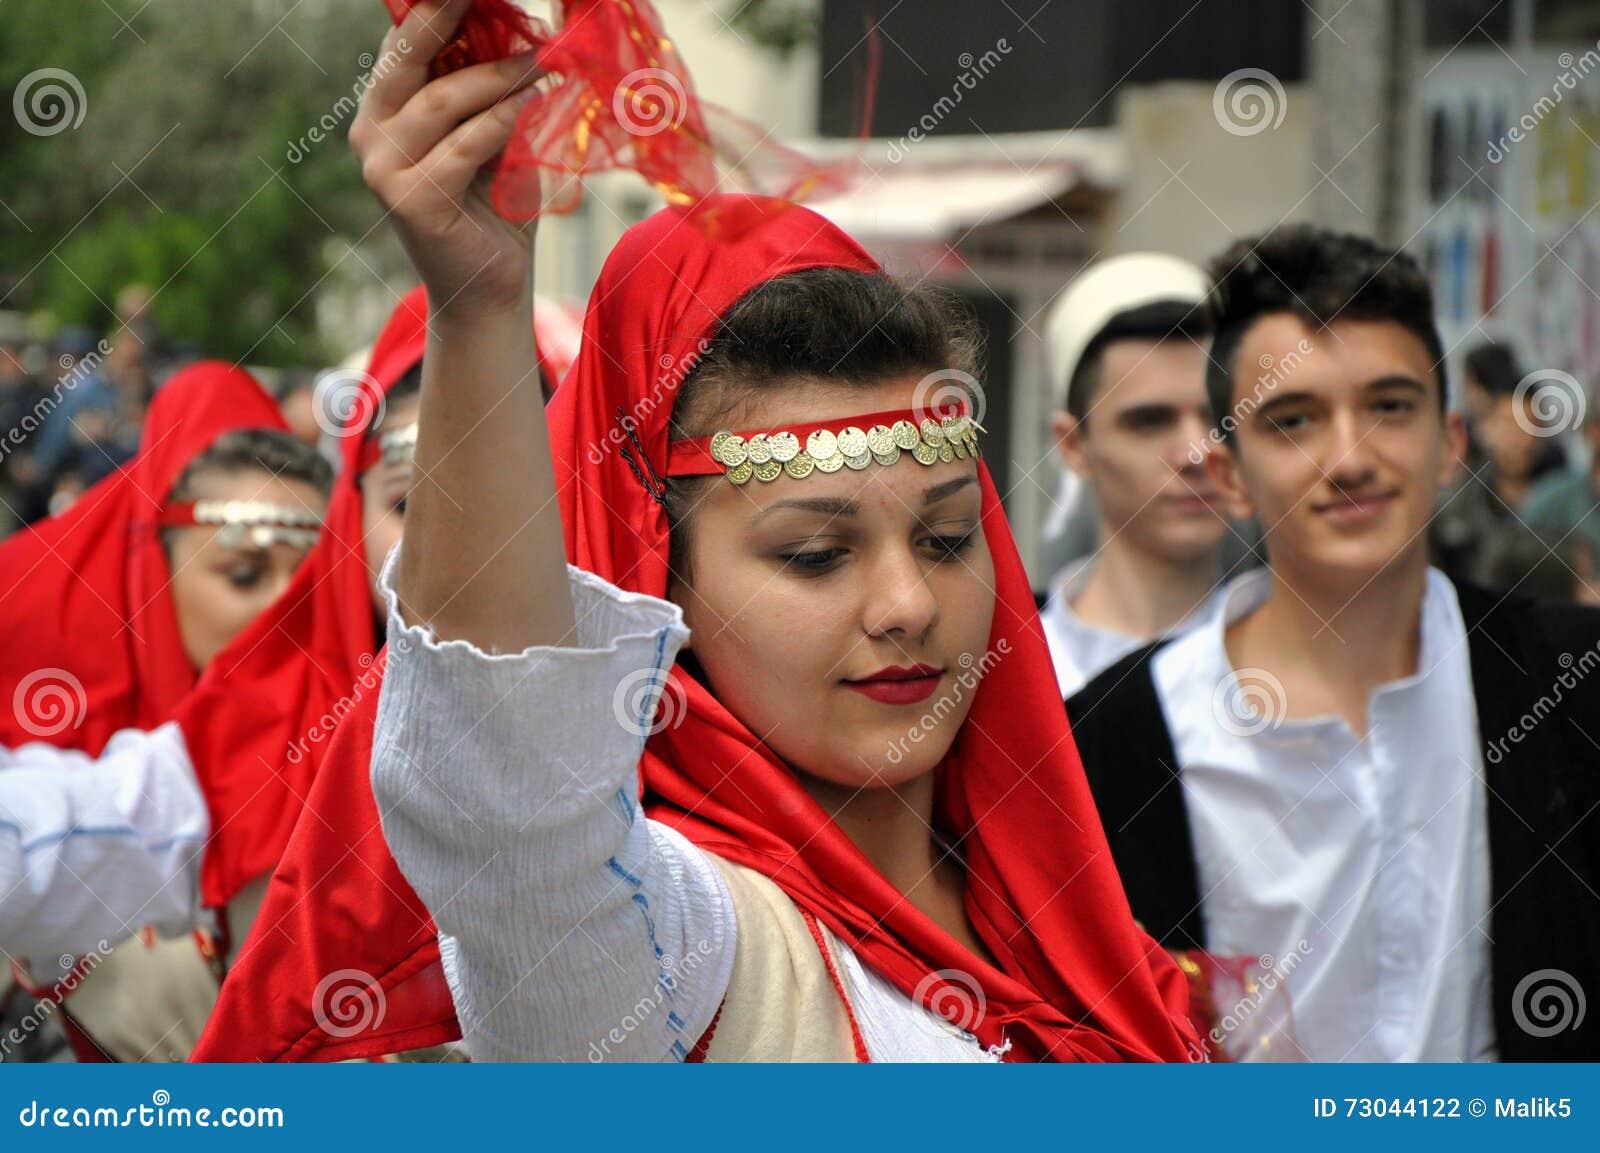 Jong Meisje in Albanees traditioneel kostuum